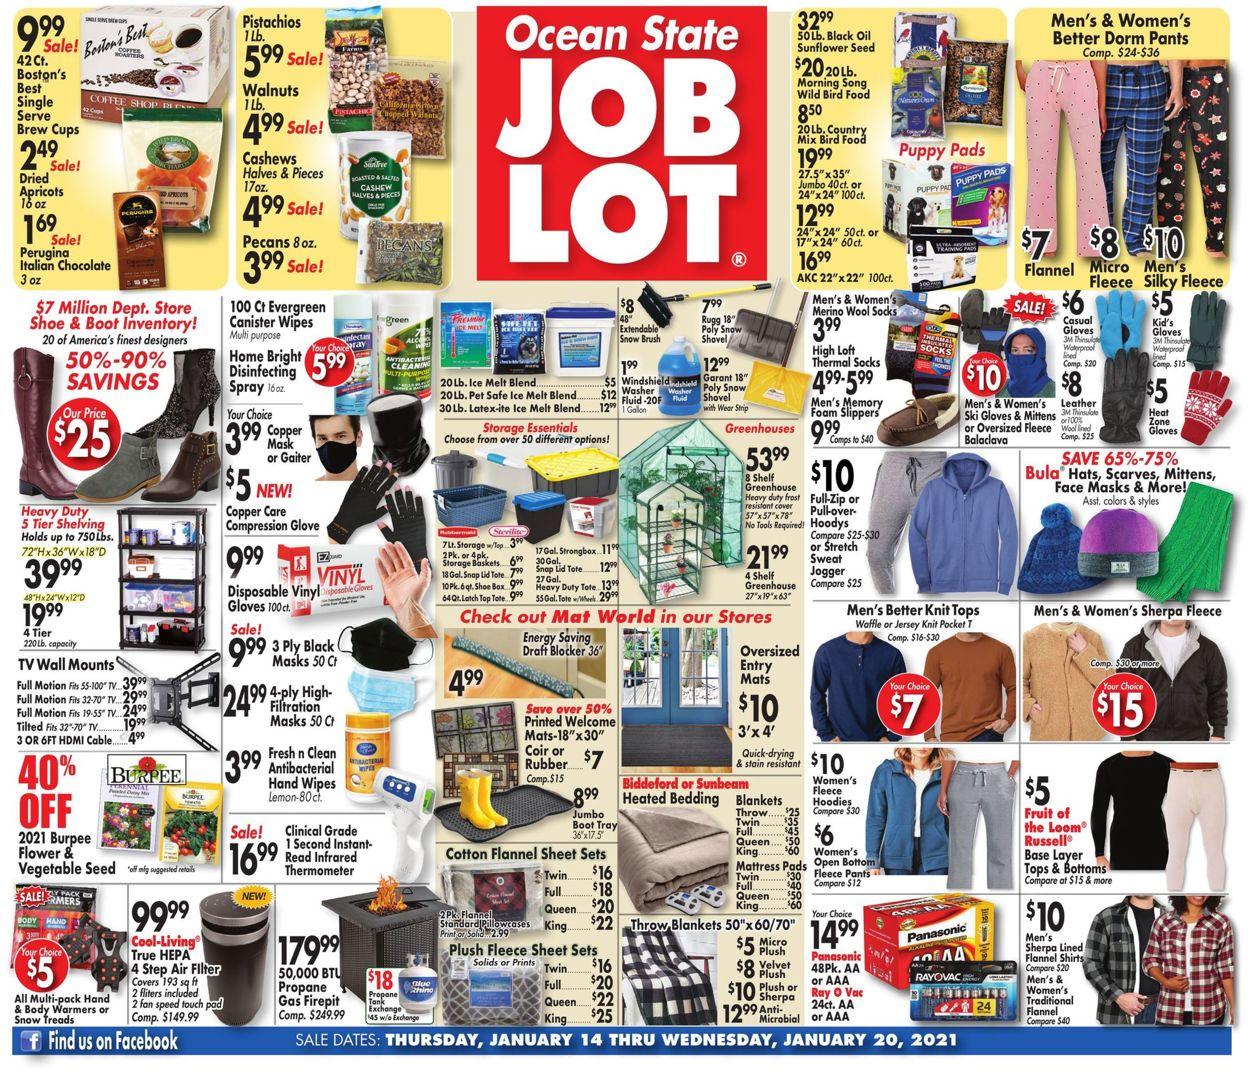 Ocean State Job Lot Weekly Ad Circular - valid 01/14-01/20/2021